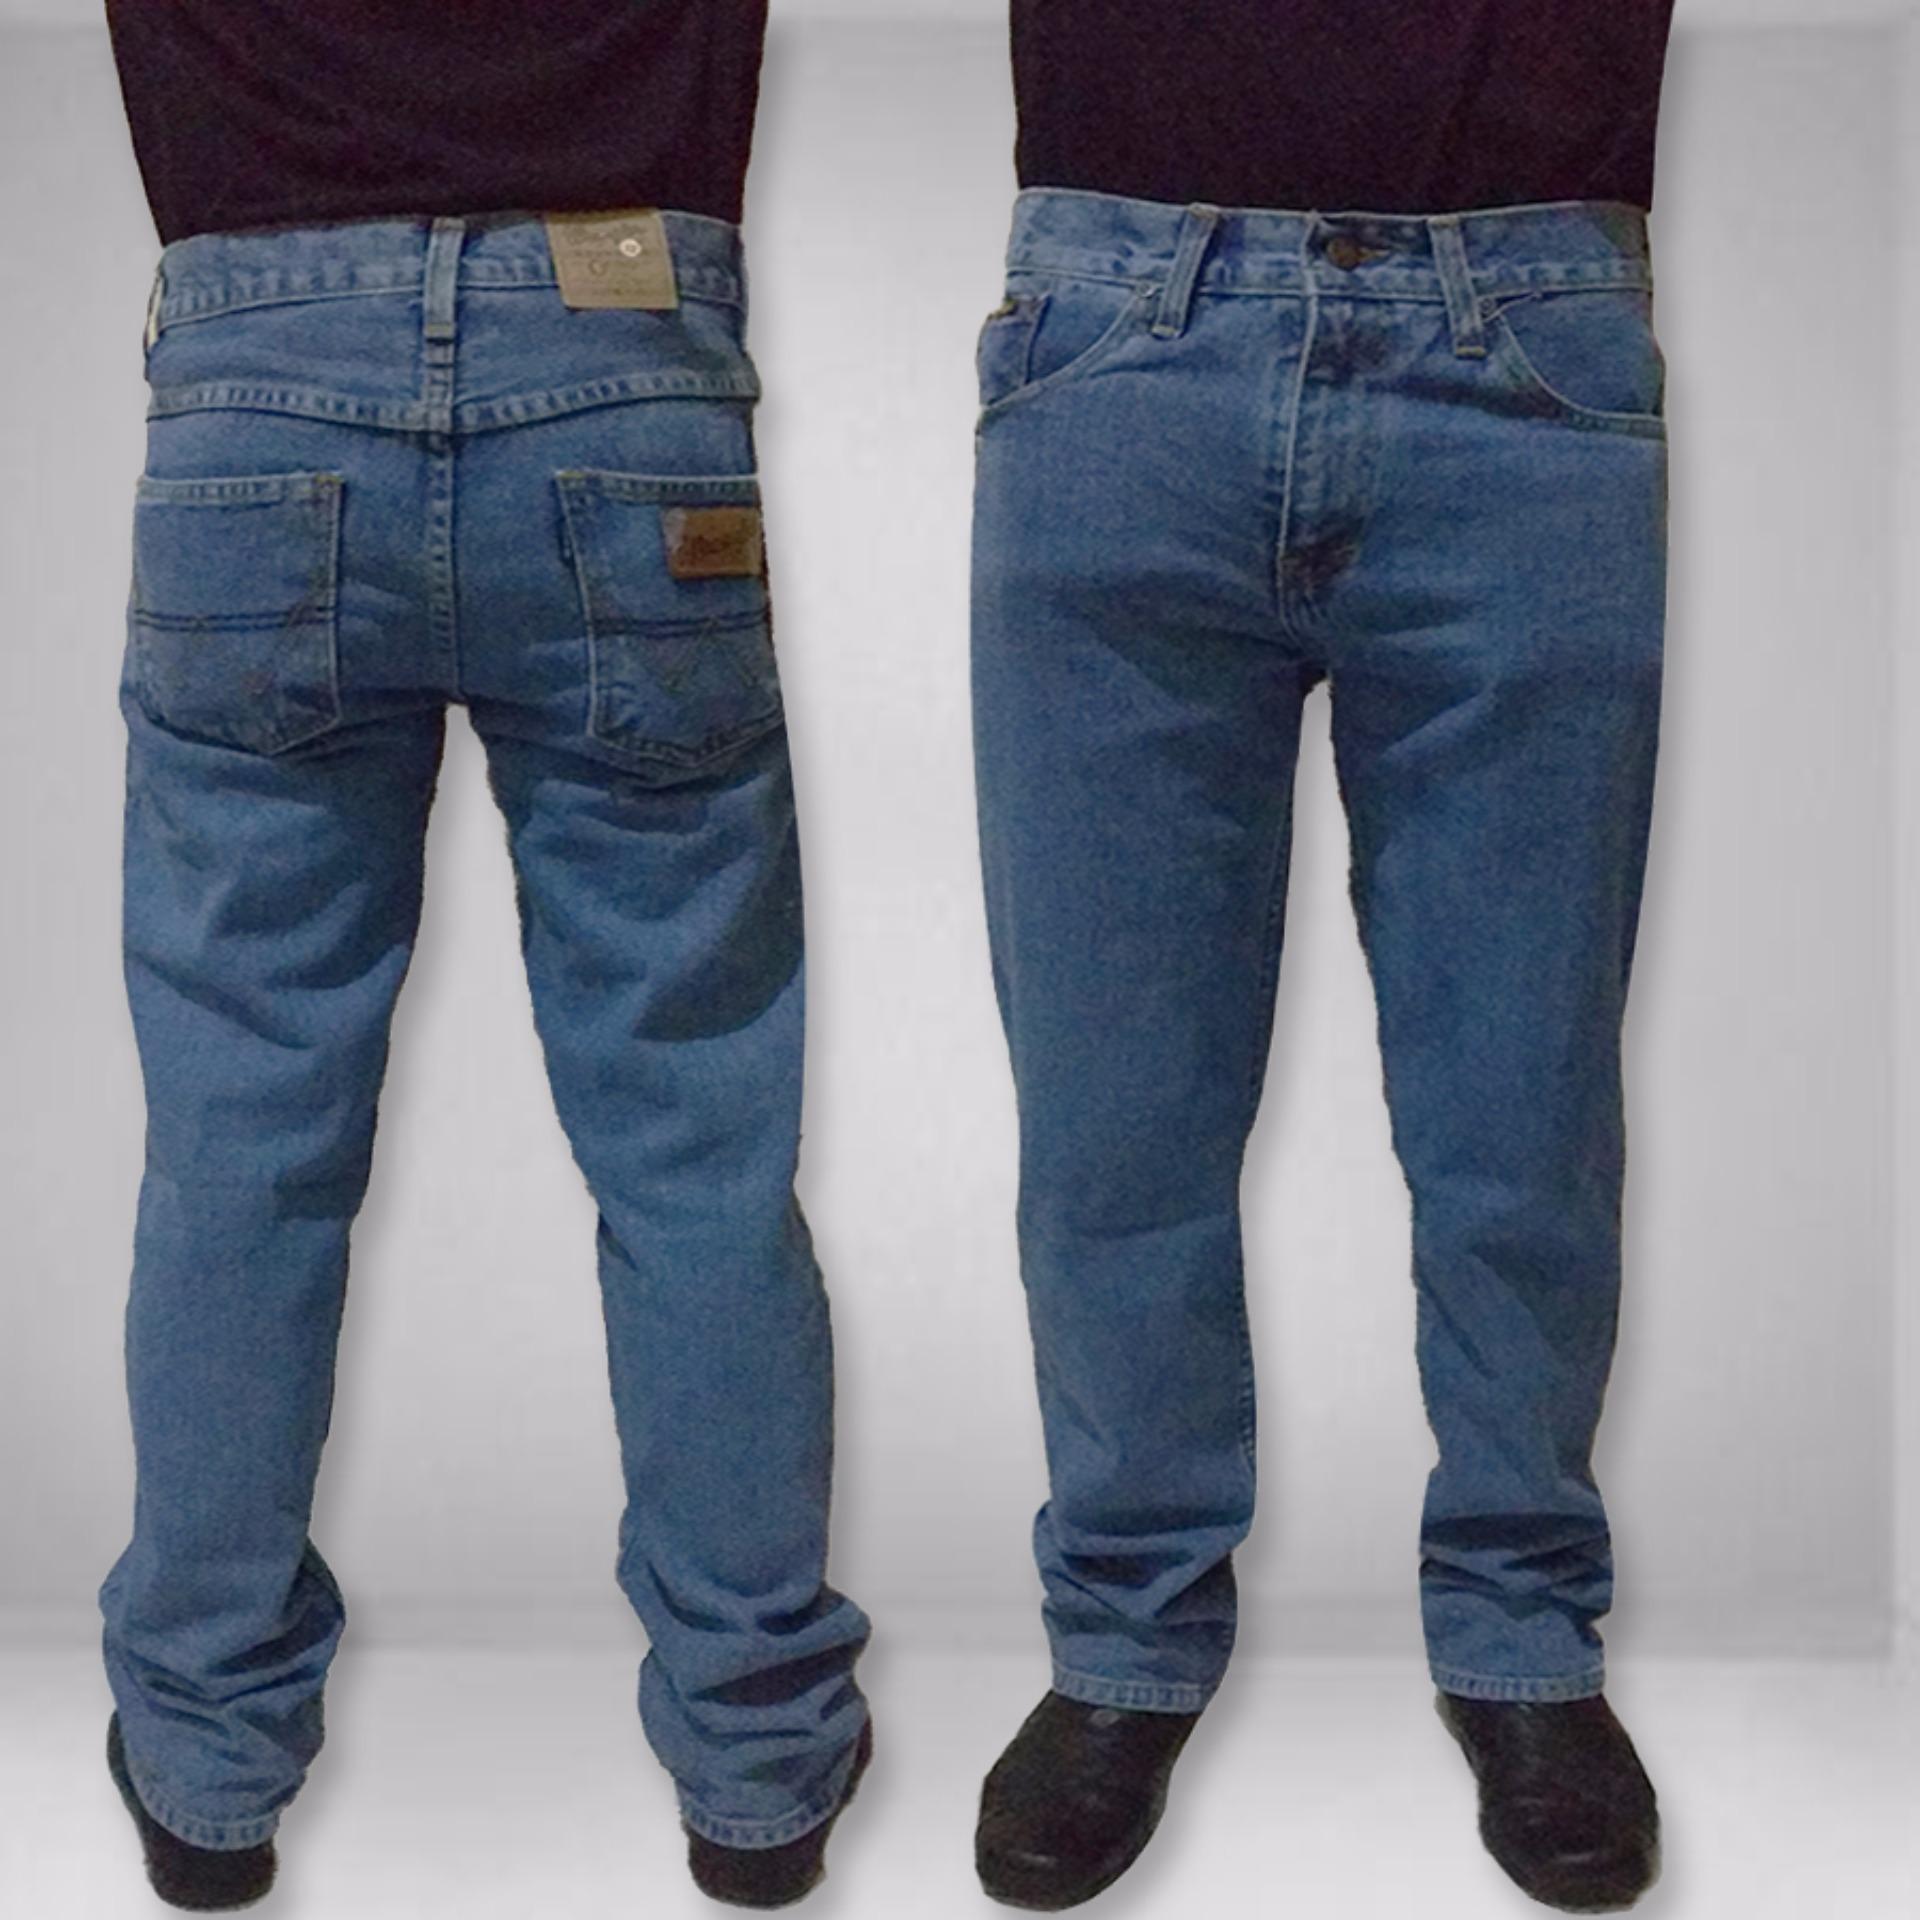 Spesifikasi Celana Jeans Wrangler Fit Standar Big Size S To Xxxl Jeans Wrangler